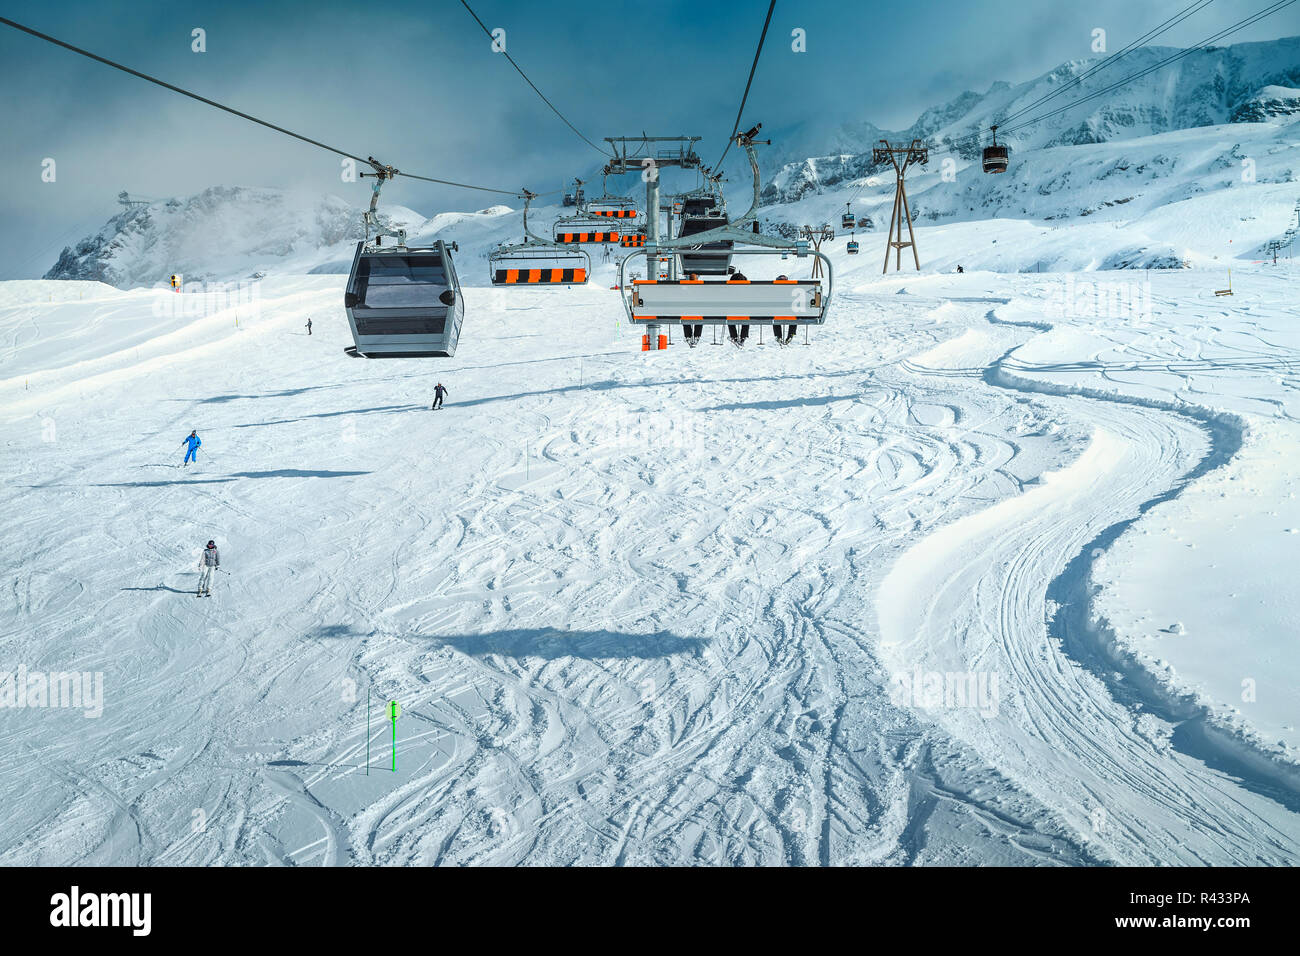 winter holiday travel destination. famous ski resort with stunning